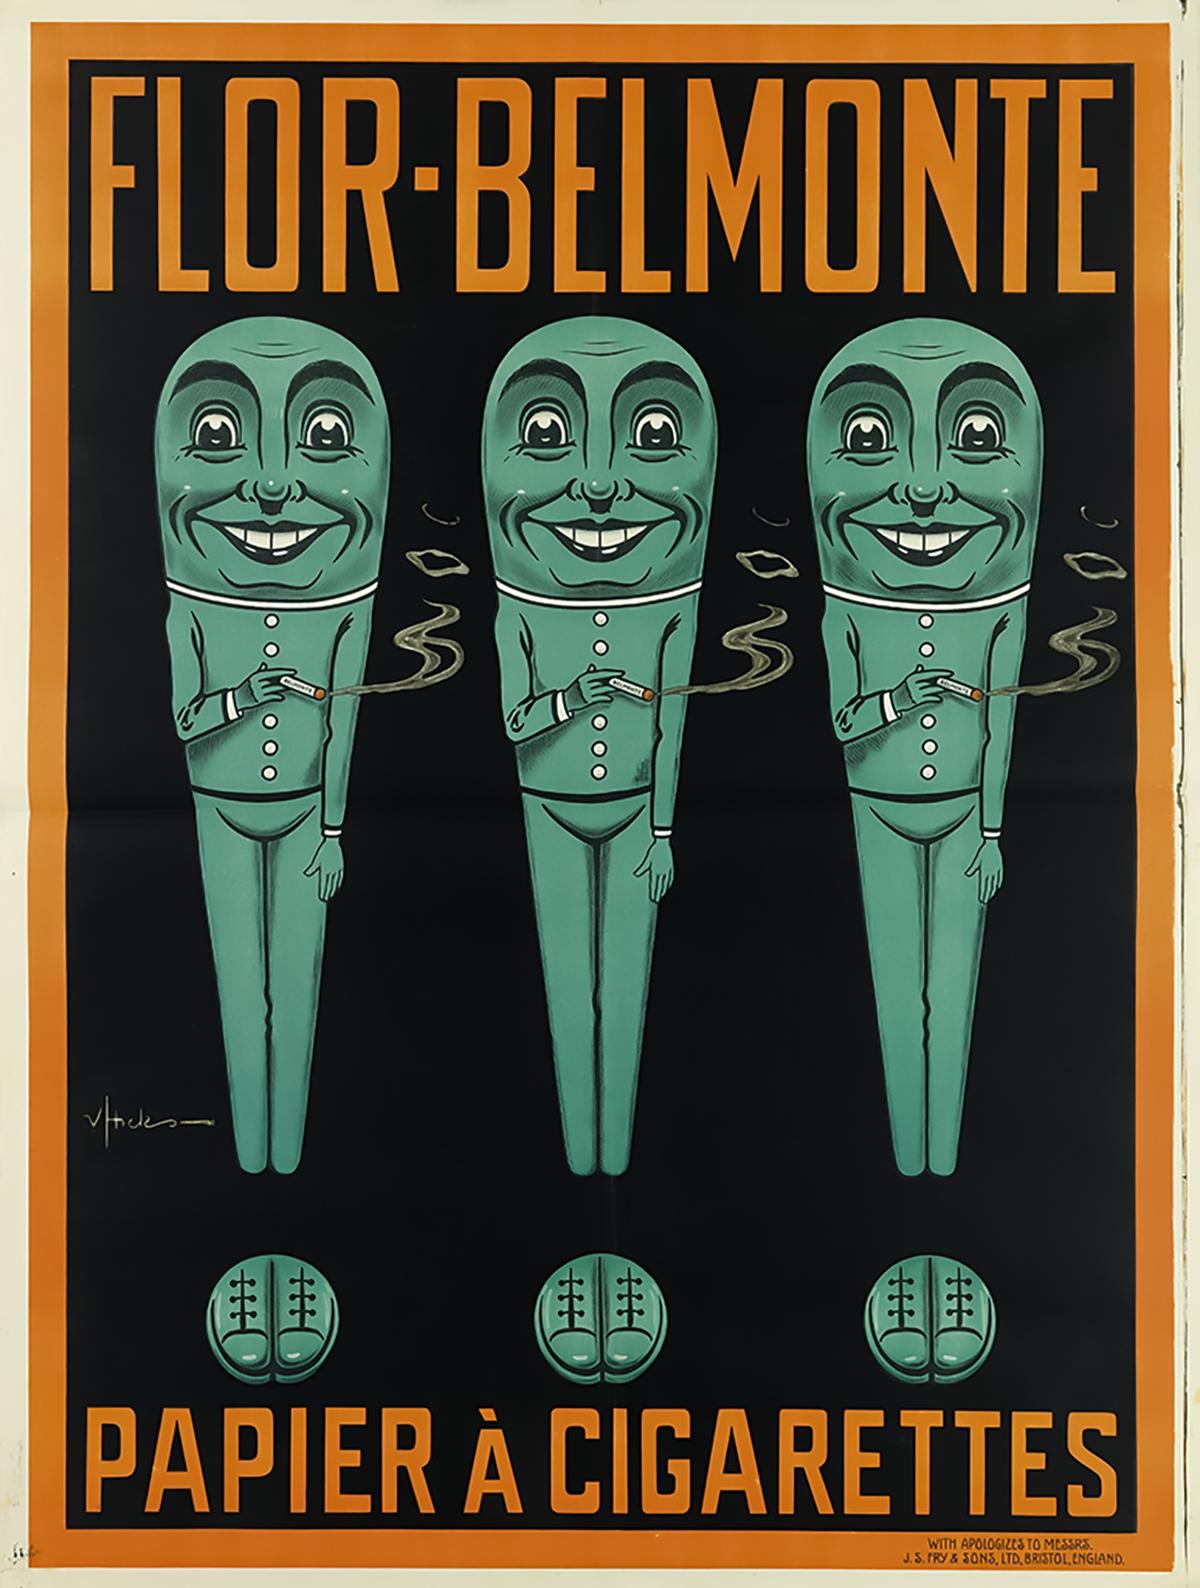 V. Hicks for Flor Belmonte 1913.